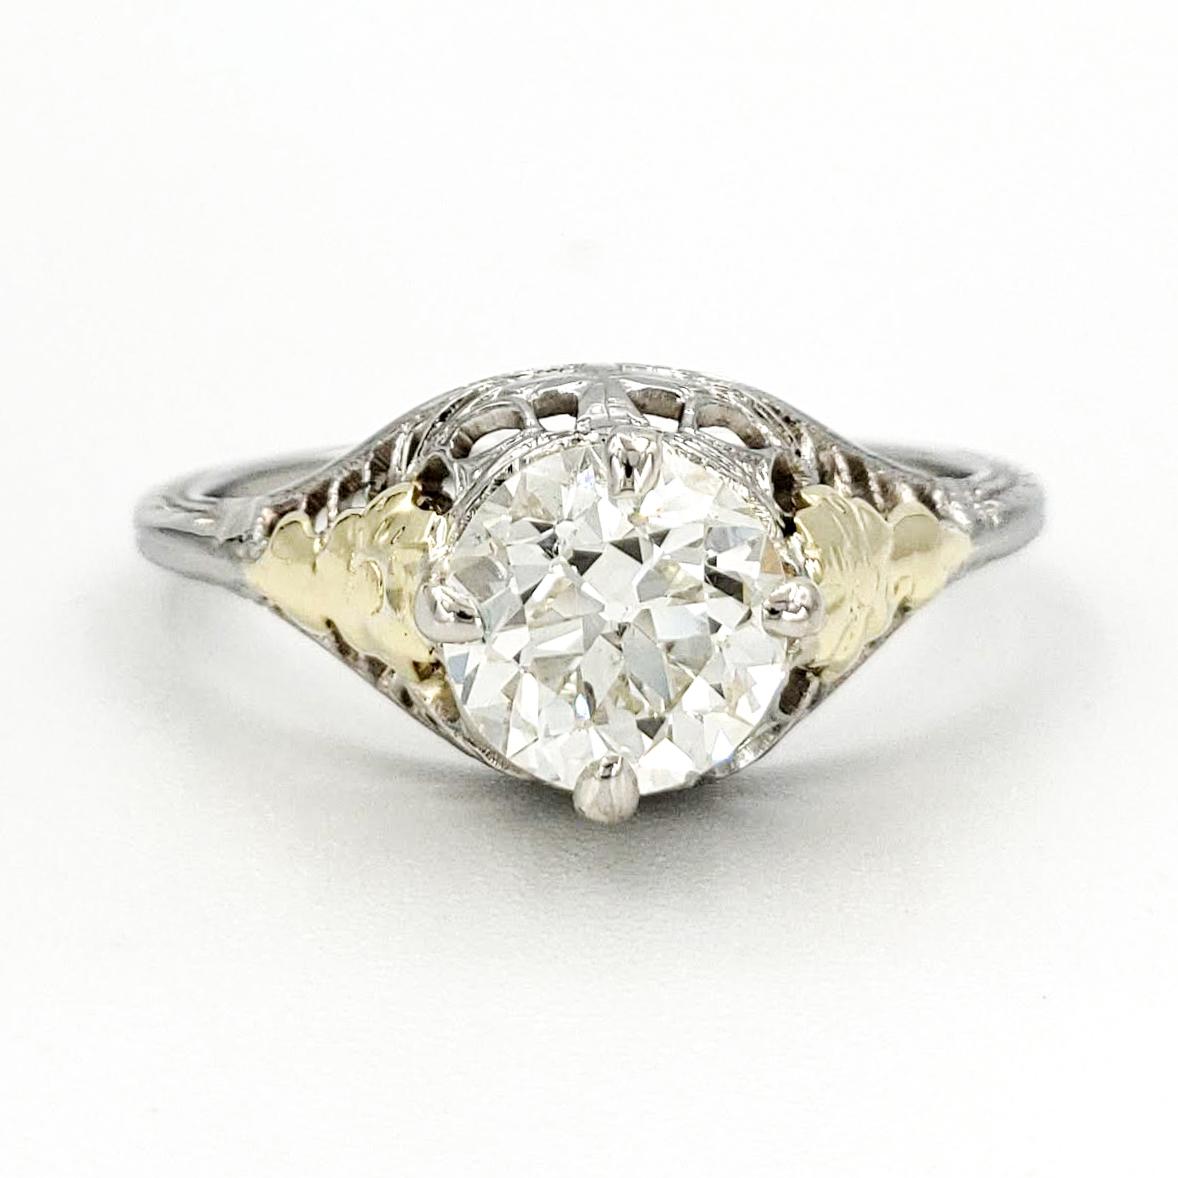 vintage-14-karat-gold-engagement-ring-with-0-94-carat-old-european-cut-diamond-egl-j-vs2